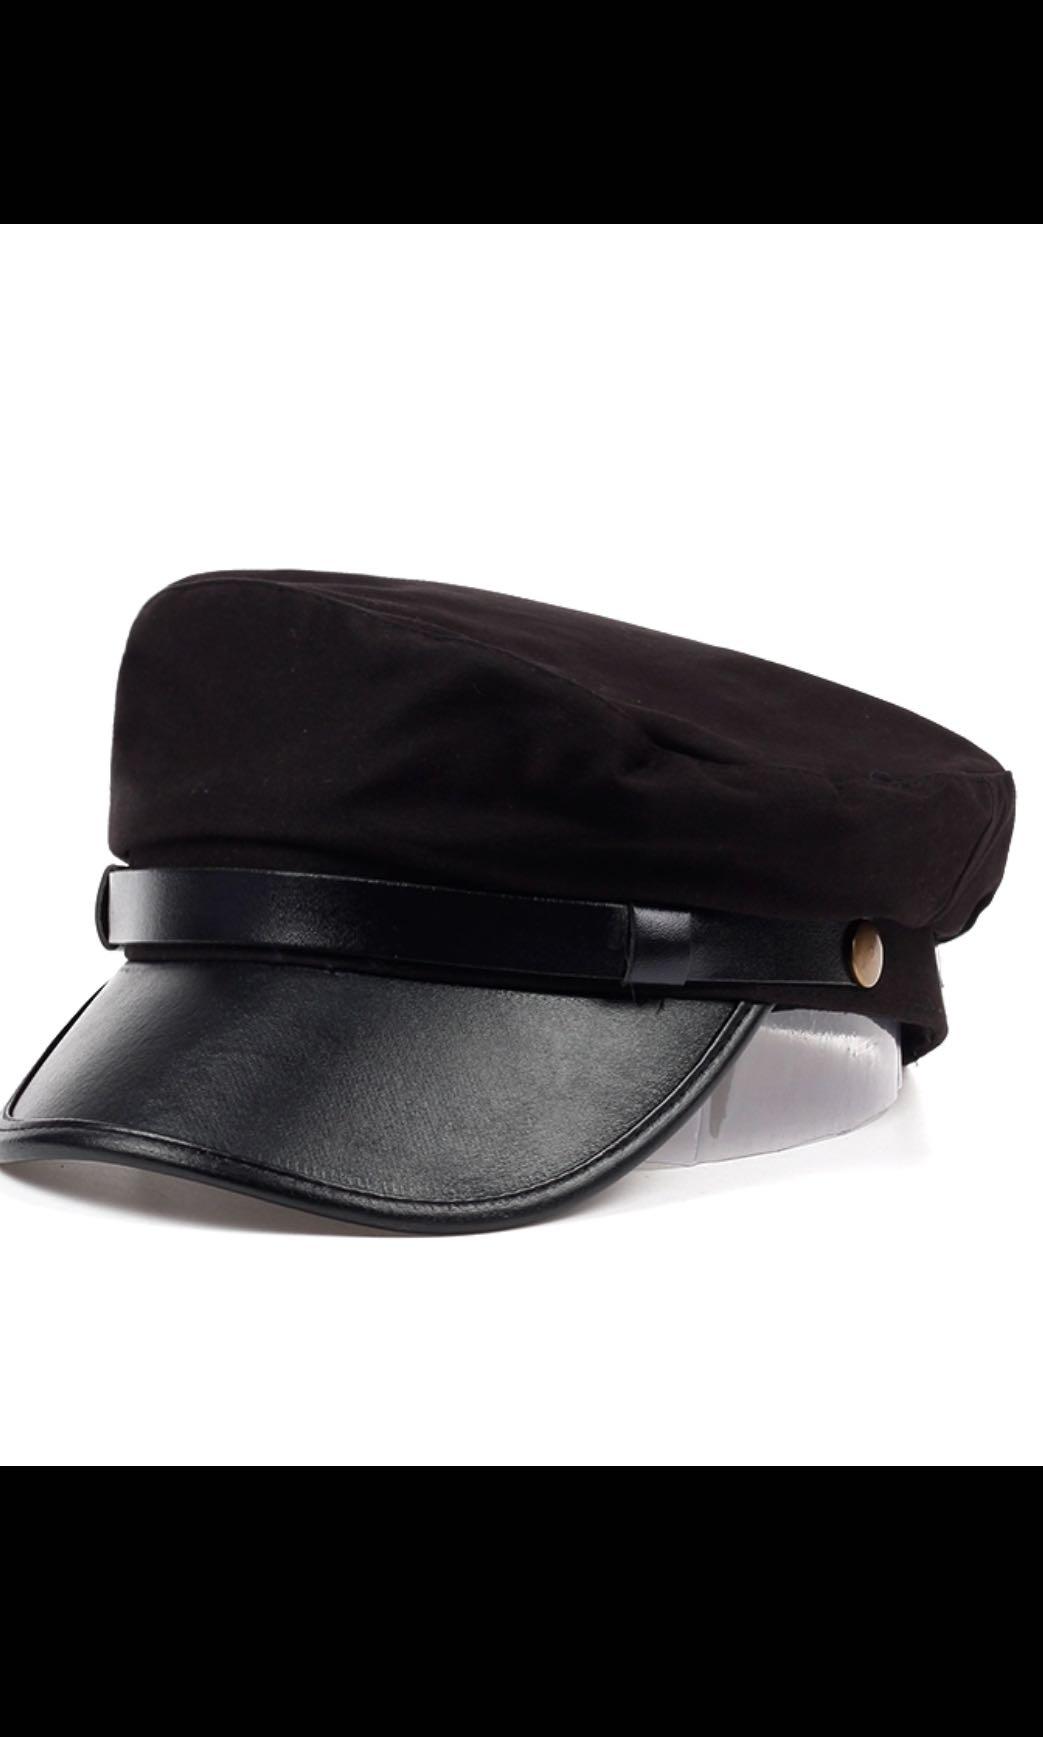 black flat army hat cap women men fashion berets hot sale